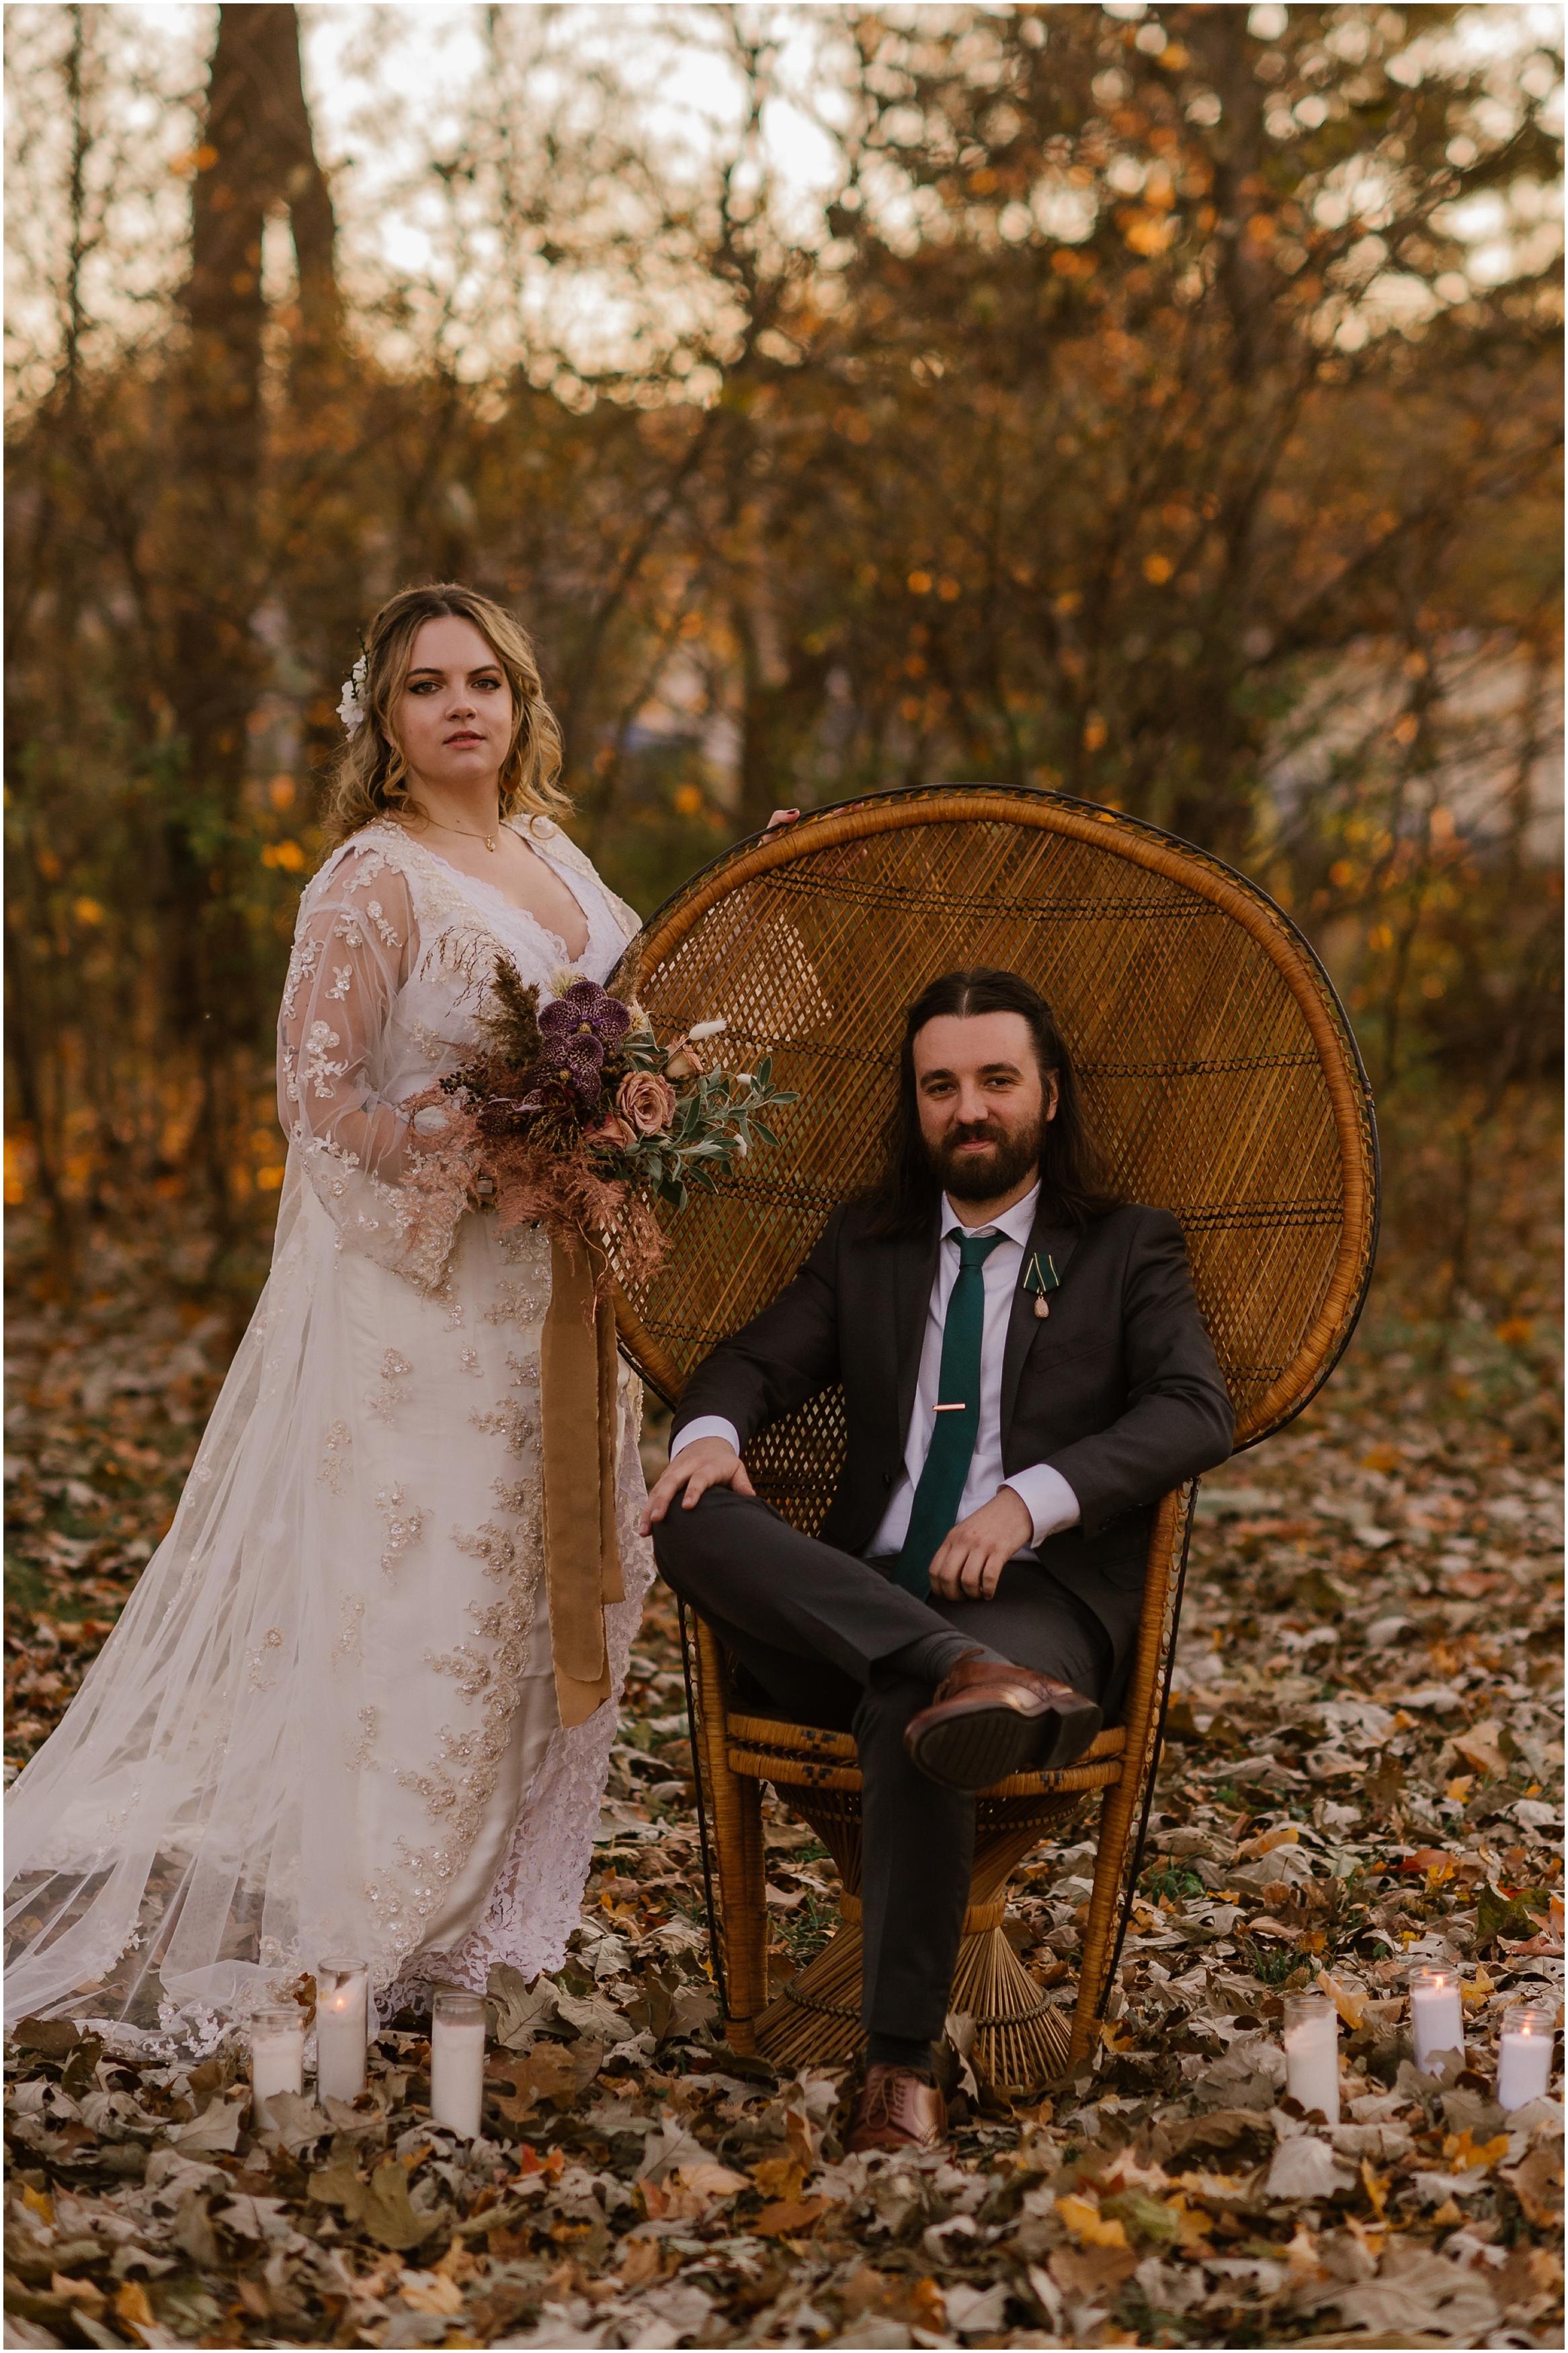 Rebecca_Shehorn_Photography_Indianapolis_Wedding_Photographer_9429.jpg